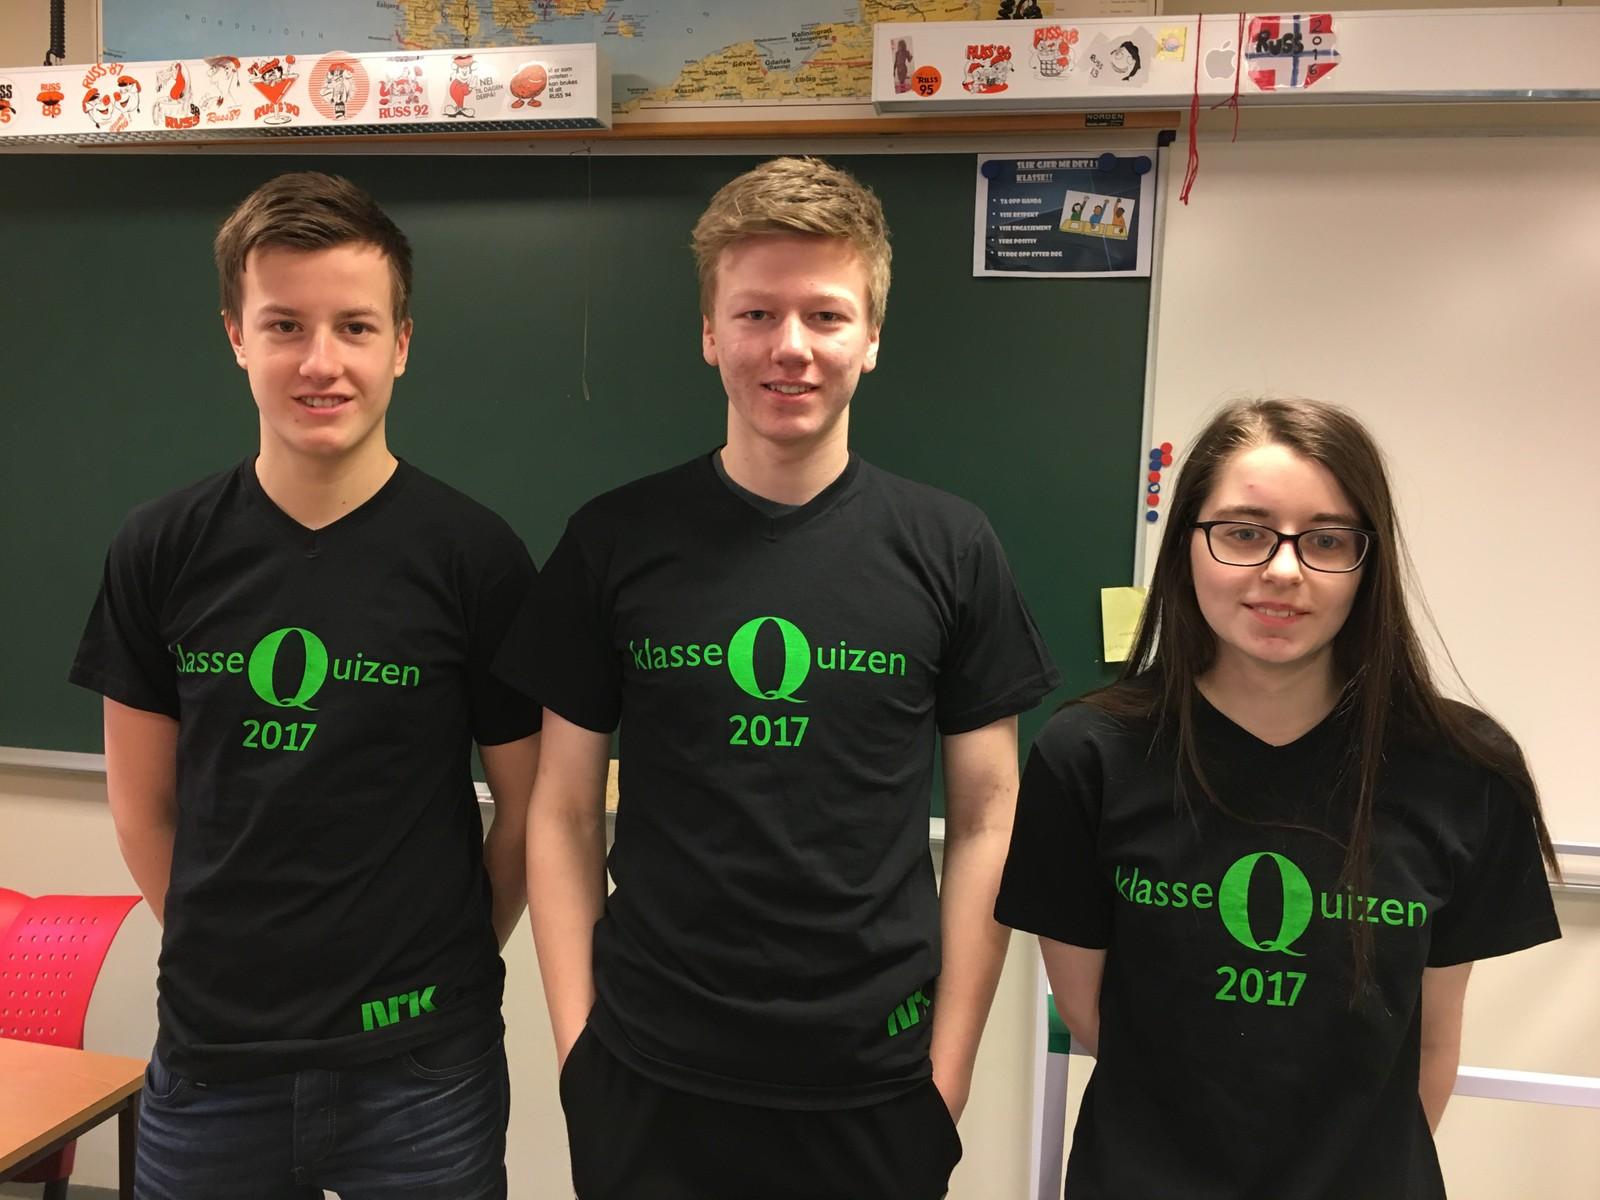 10 POENG: Matre skule sine unge lovende, fra venstre: Jostein Haugsvær, Kristian Asheim og Malin Matre.